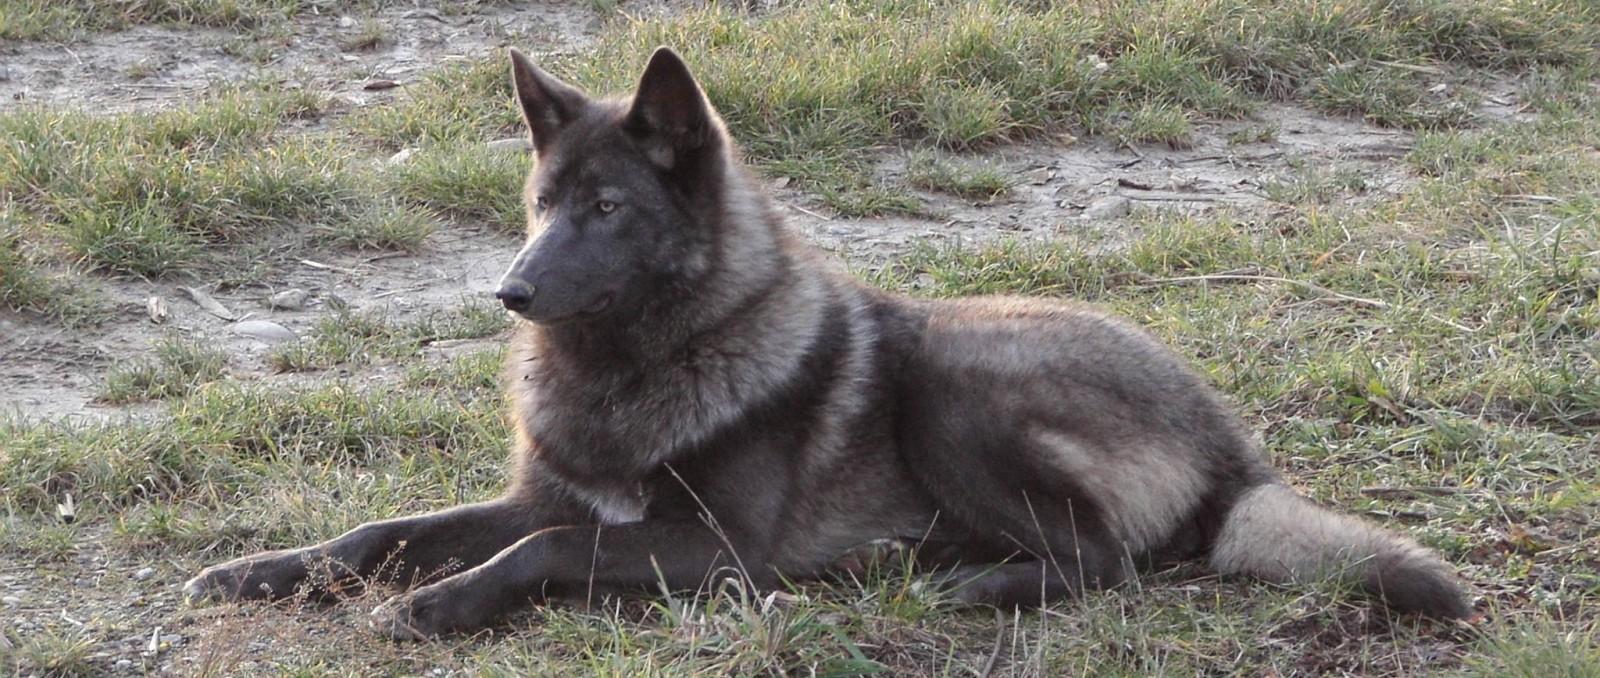 Loup hybride prix – chaton chien à donner